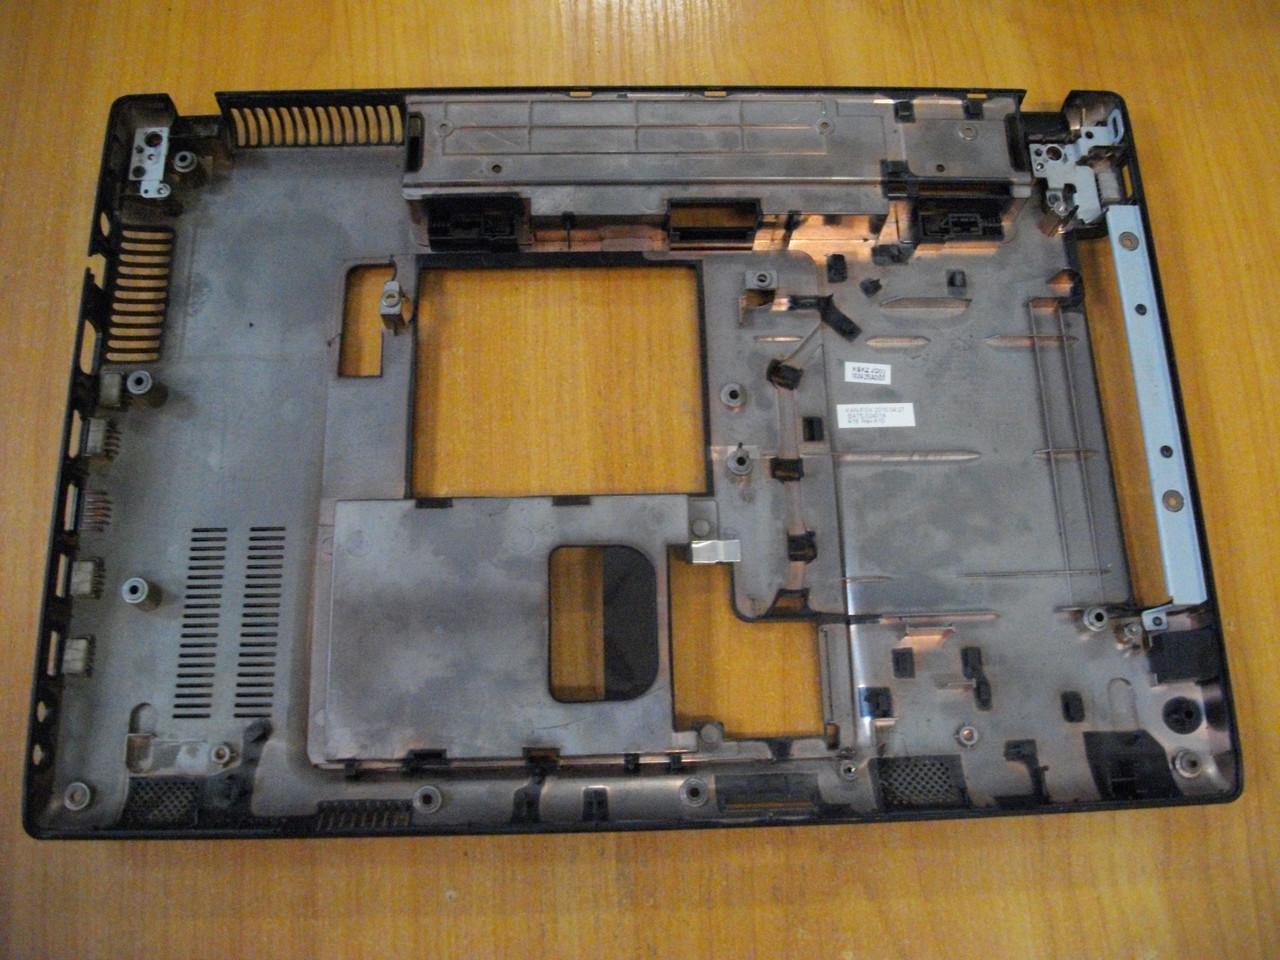 Корпус низ Нижня частина корпусу BA75-02401A Samsung R425 R428 P428 P430 R431 R439 R440 БУ